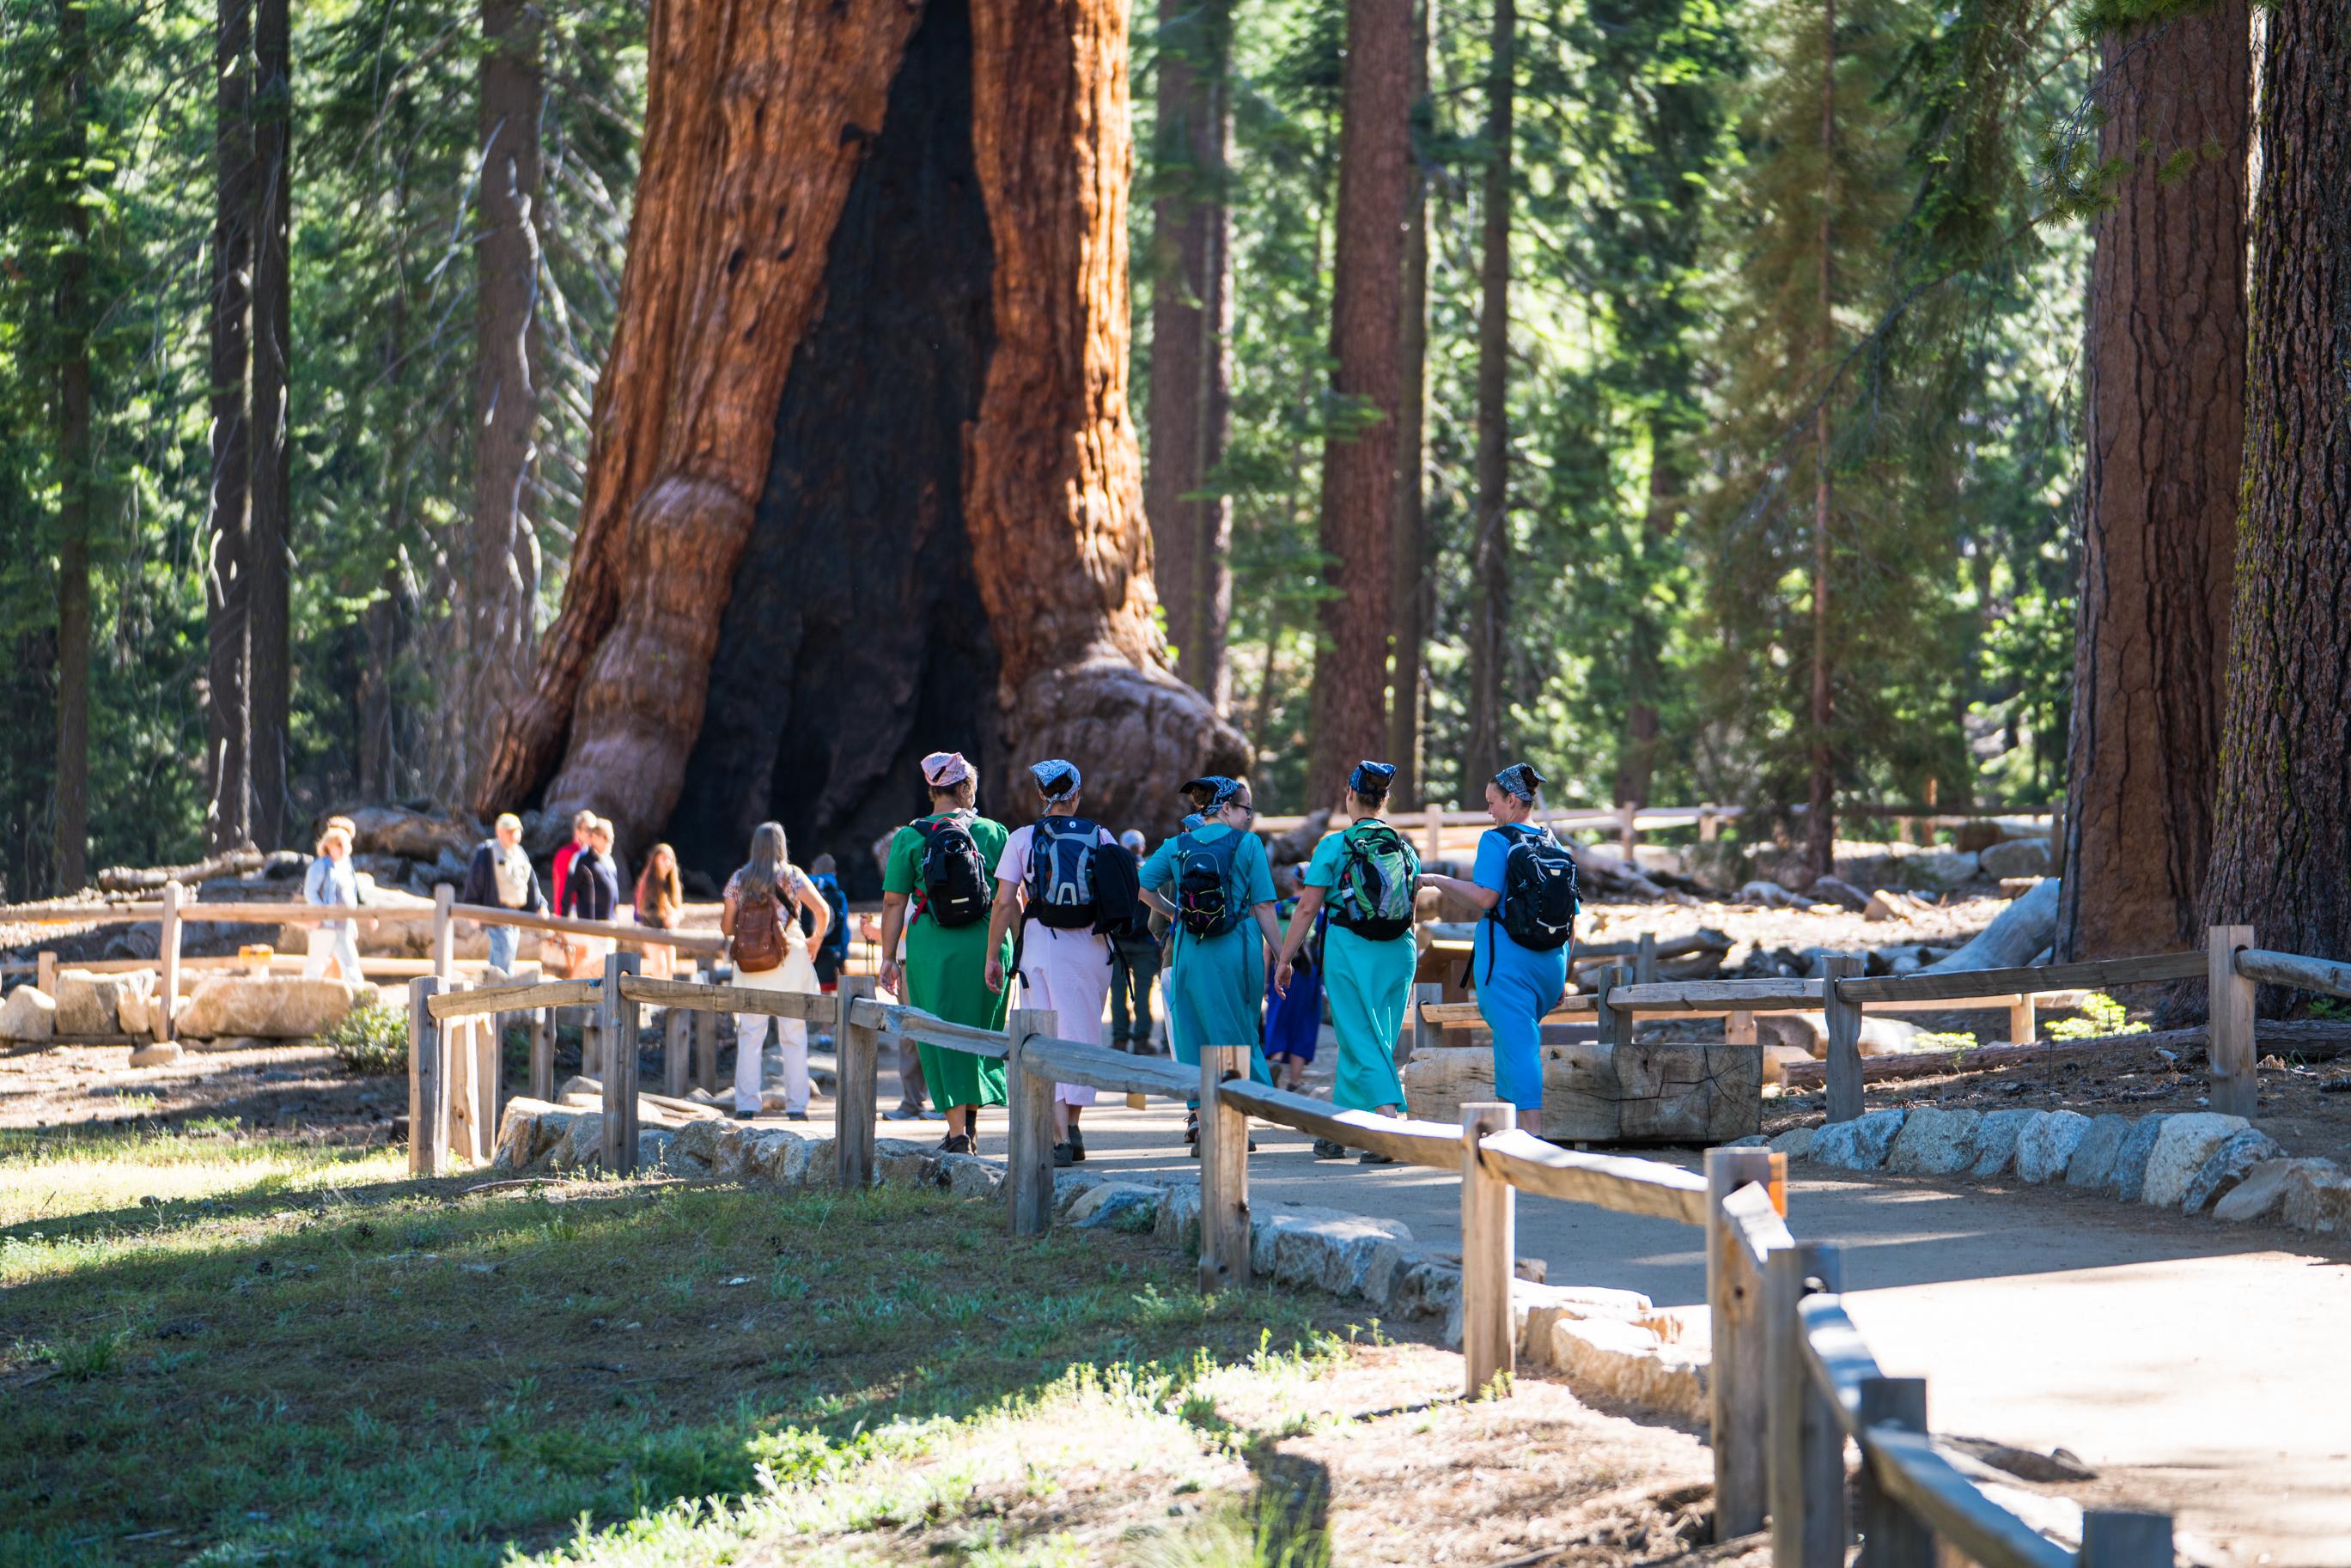 Mariposa Grove, Giant Sequoias, Hiking, Yosemite National Park, Grizzly Giant